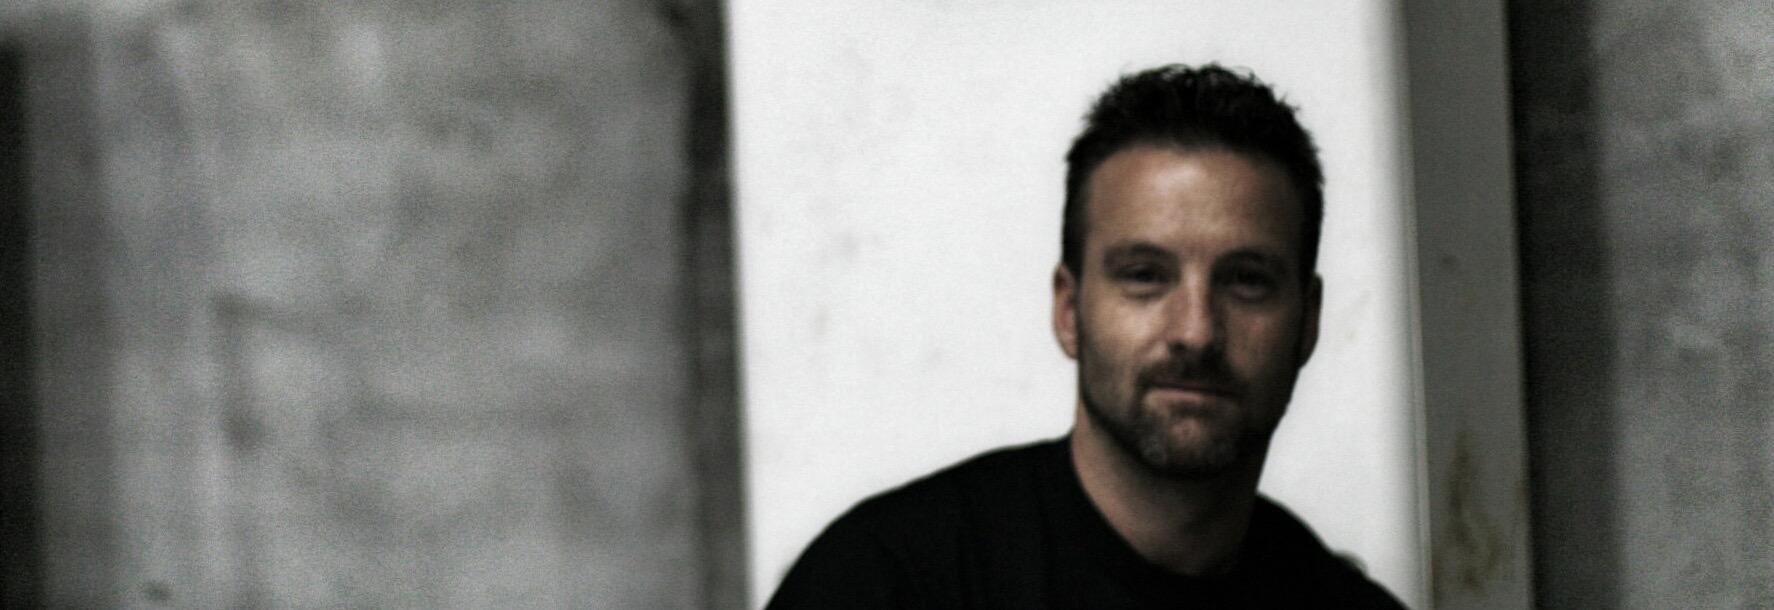 Chris Shadley